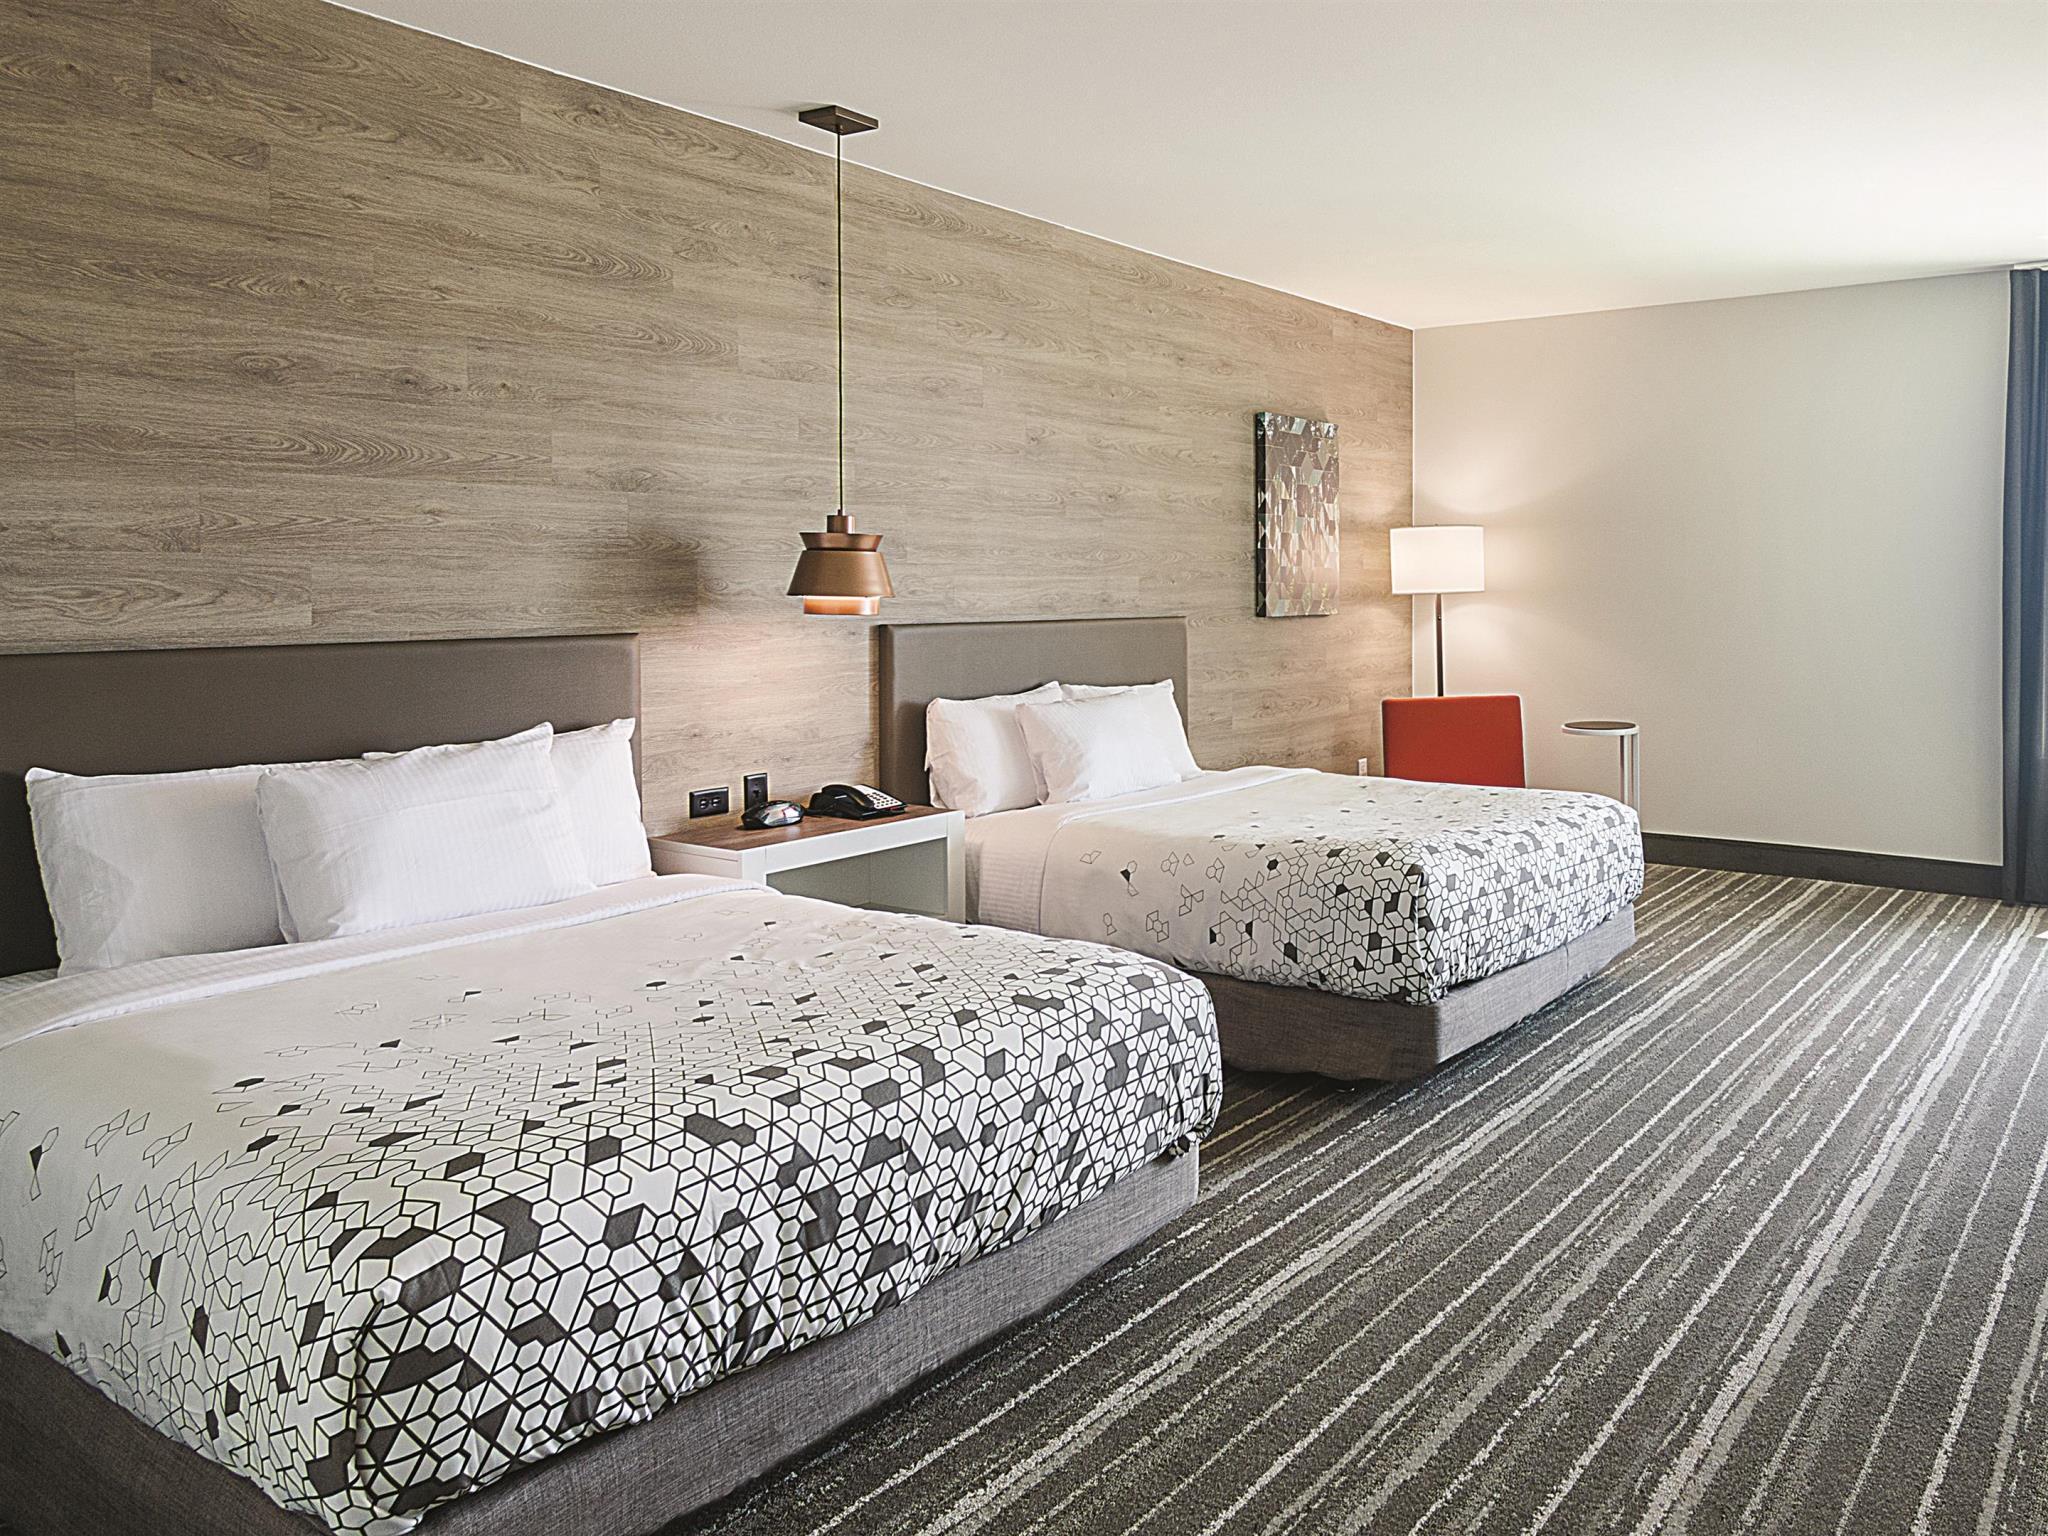 La Quinta Inn And Suites By Wyndham Plano Legacy Frisco